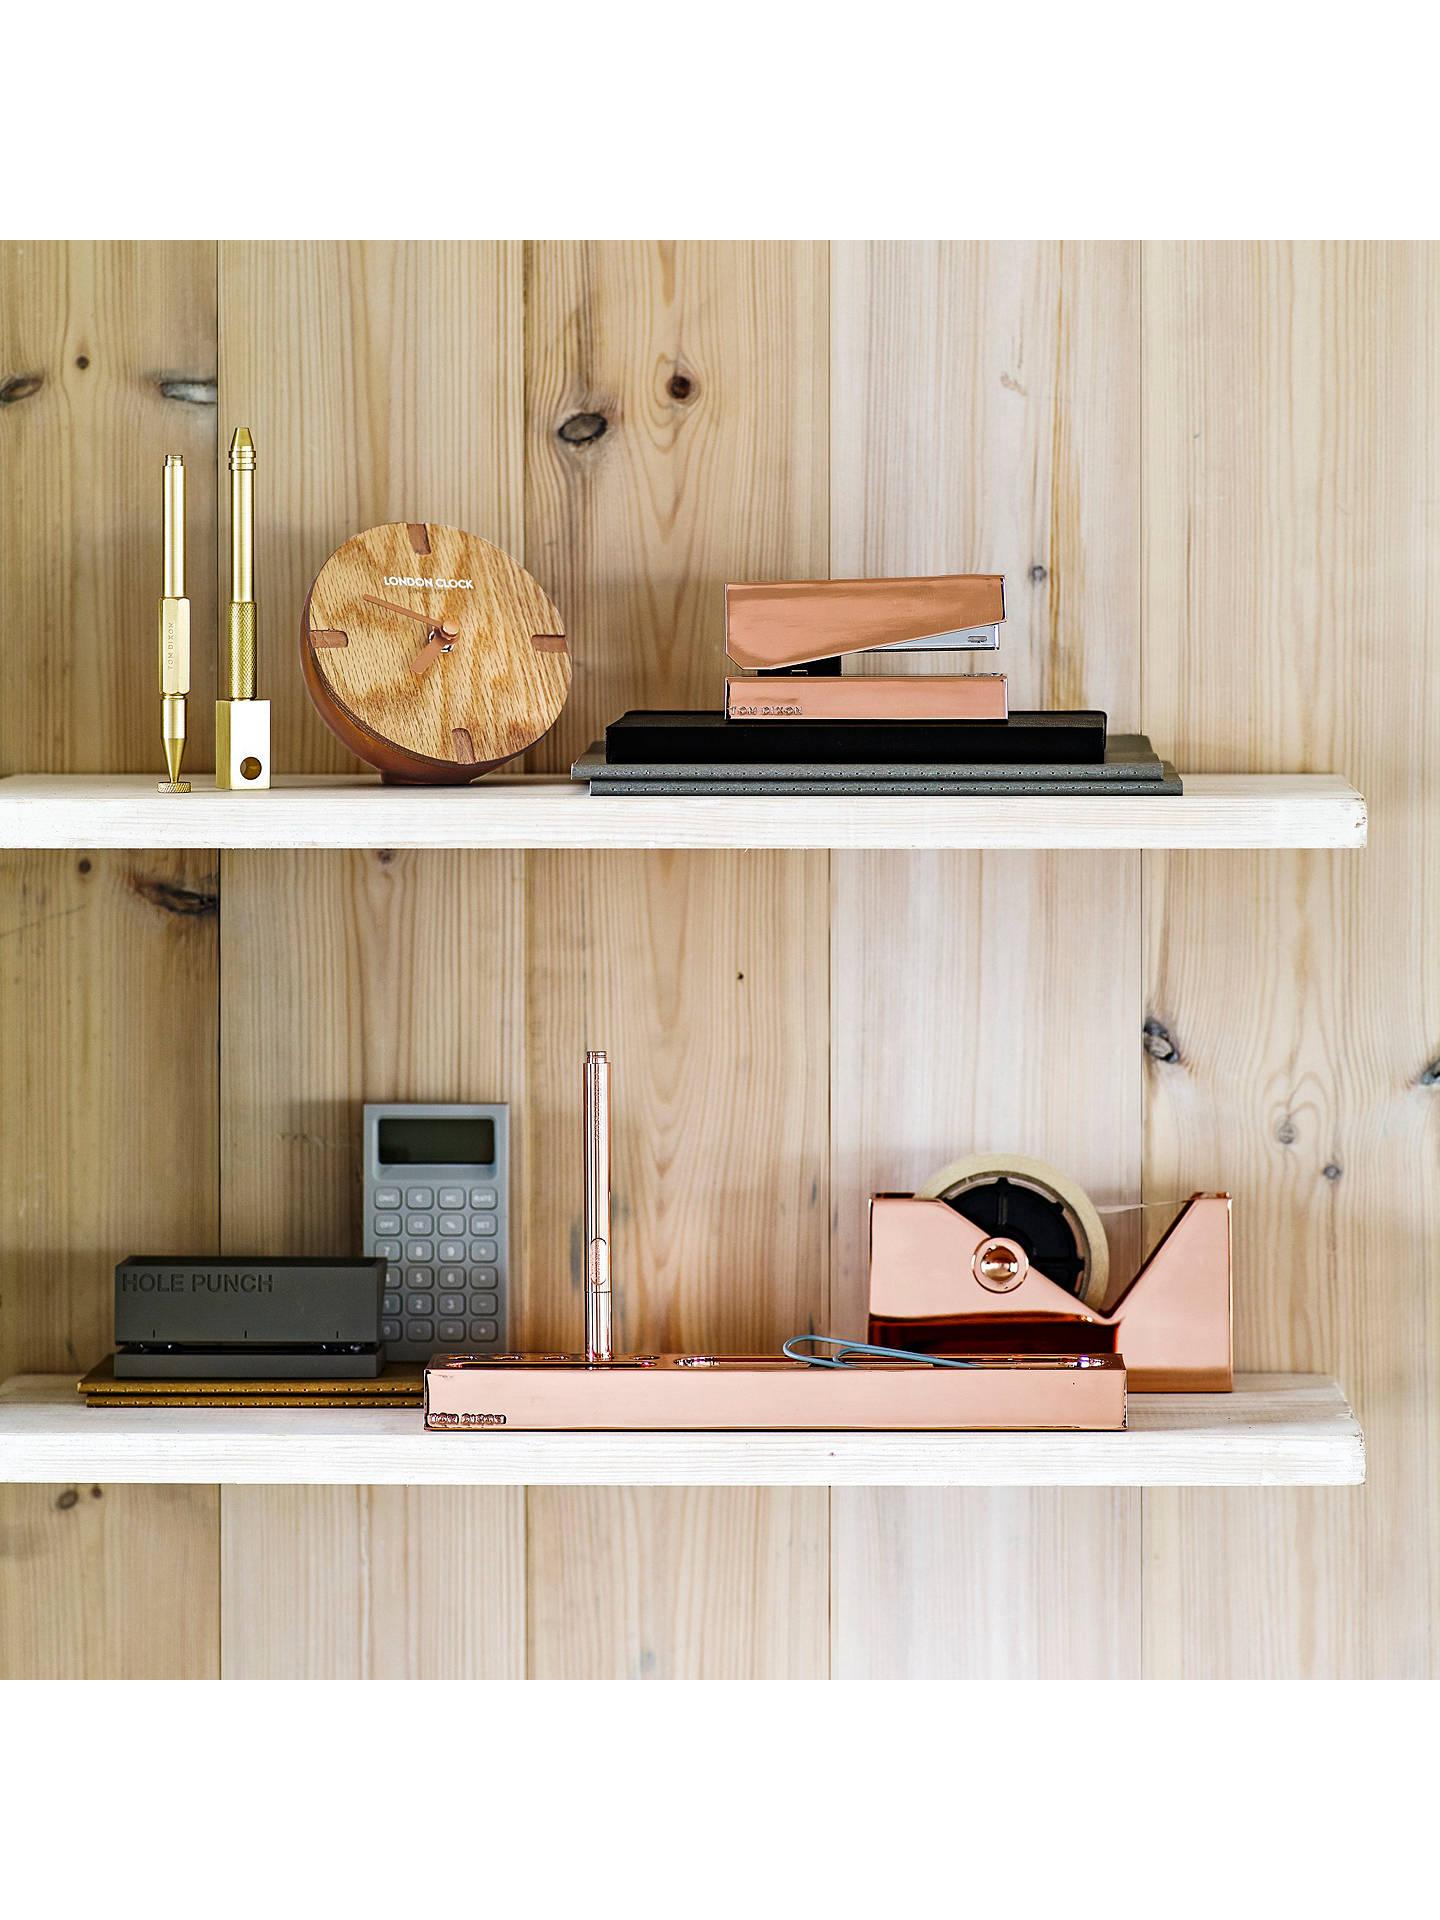 Tom dixon copper plated cube tape dispenser at john lewis partners for John lewis home design service reviews